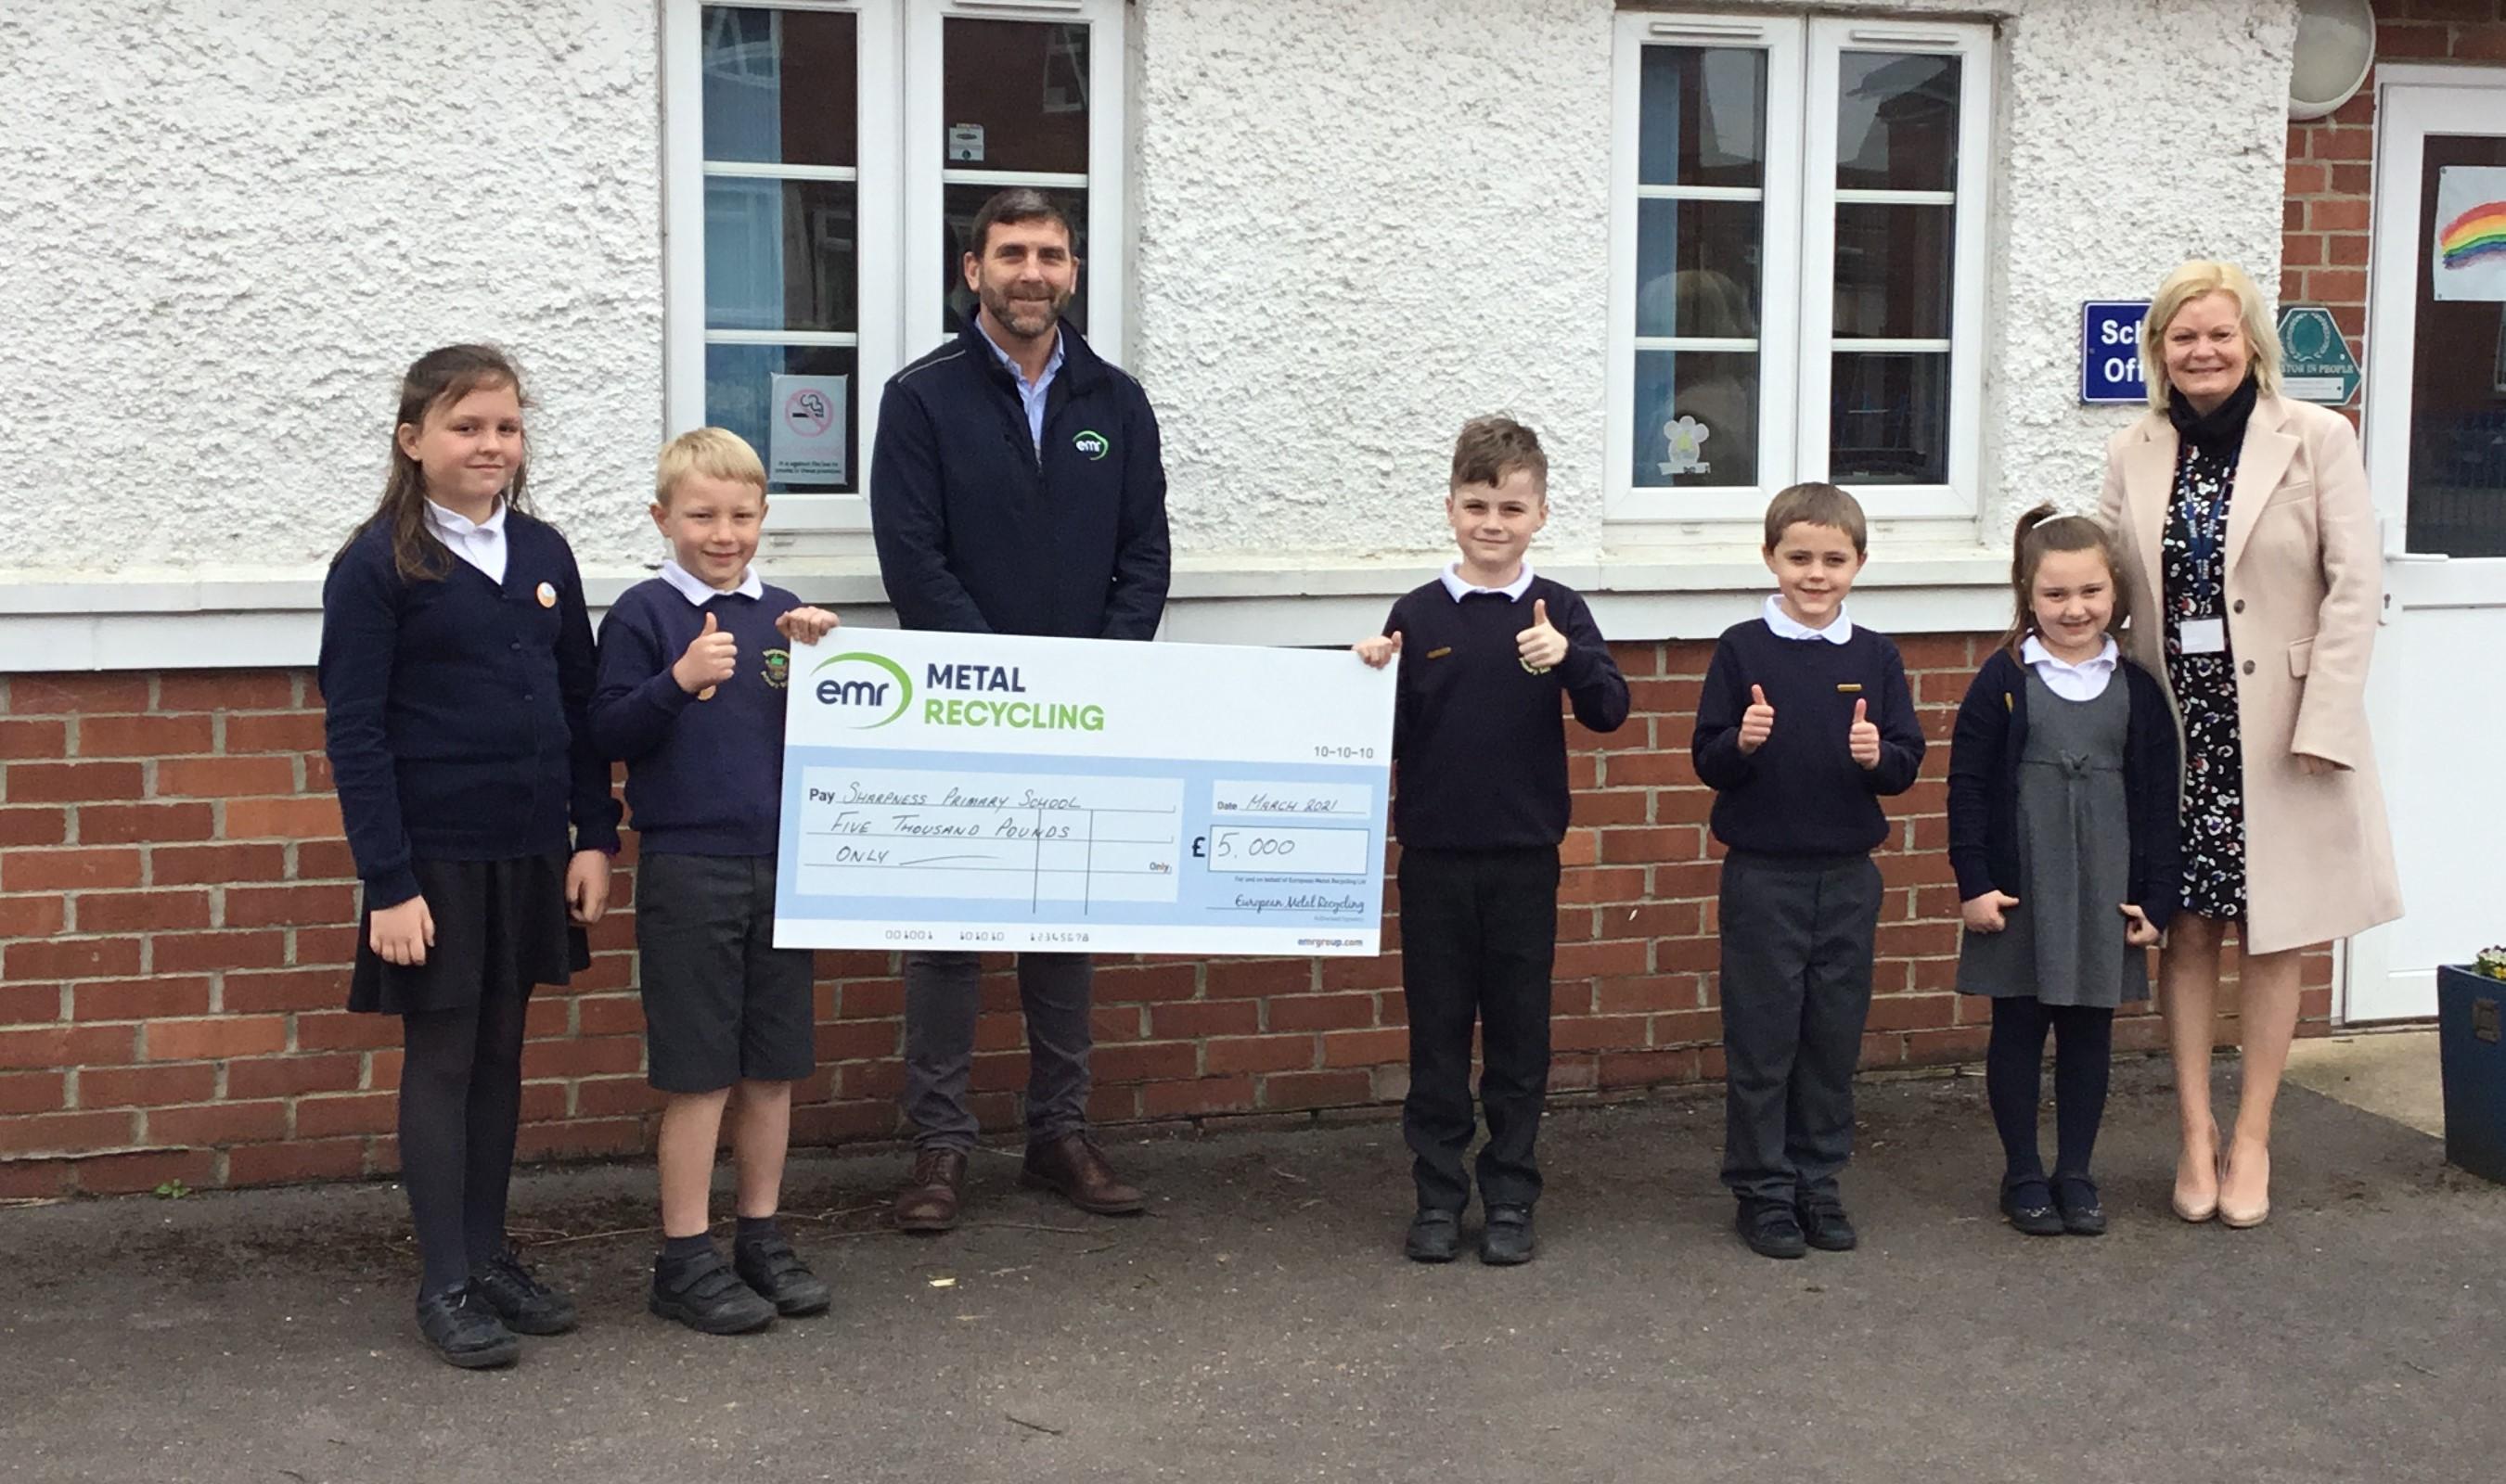 EMR Sharpness awards donation to Sharpness Primary School